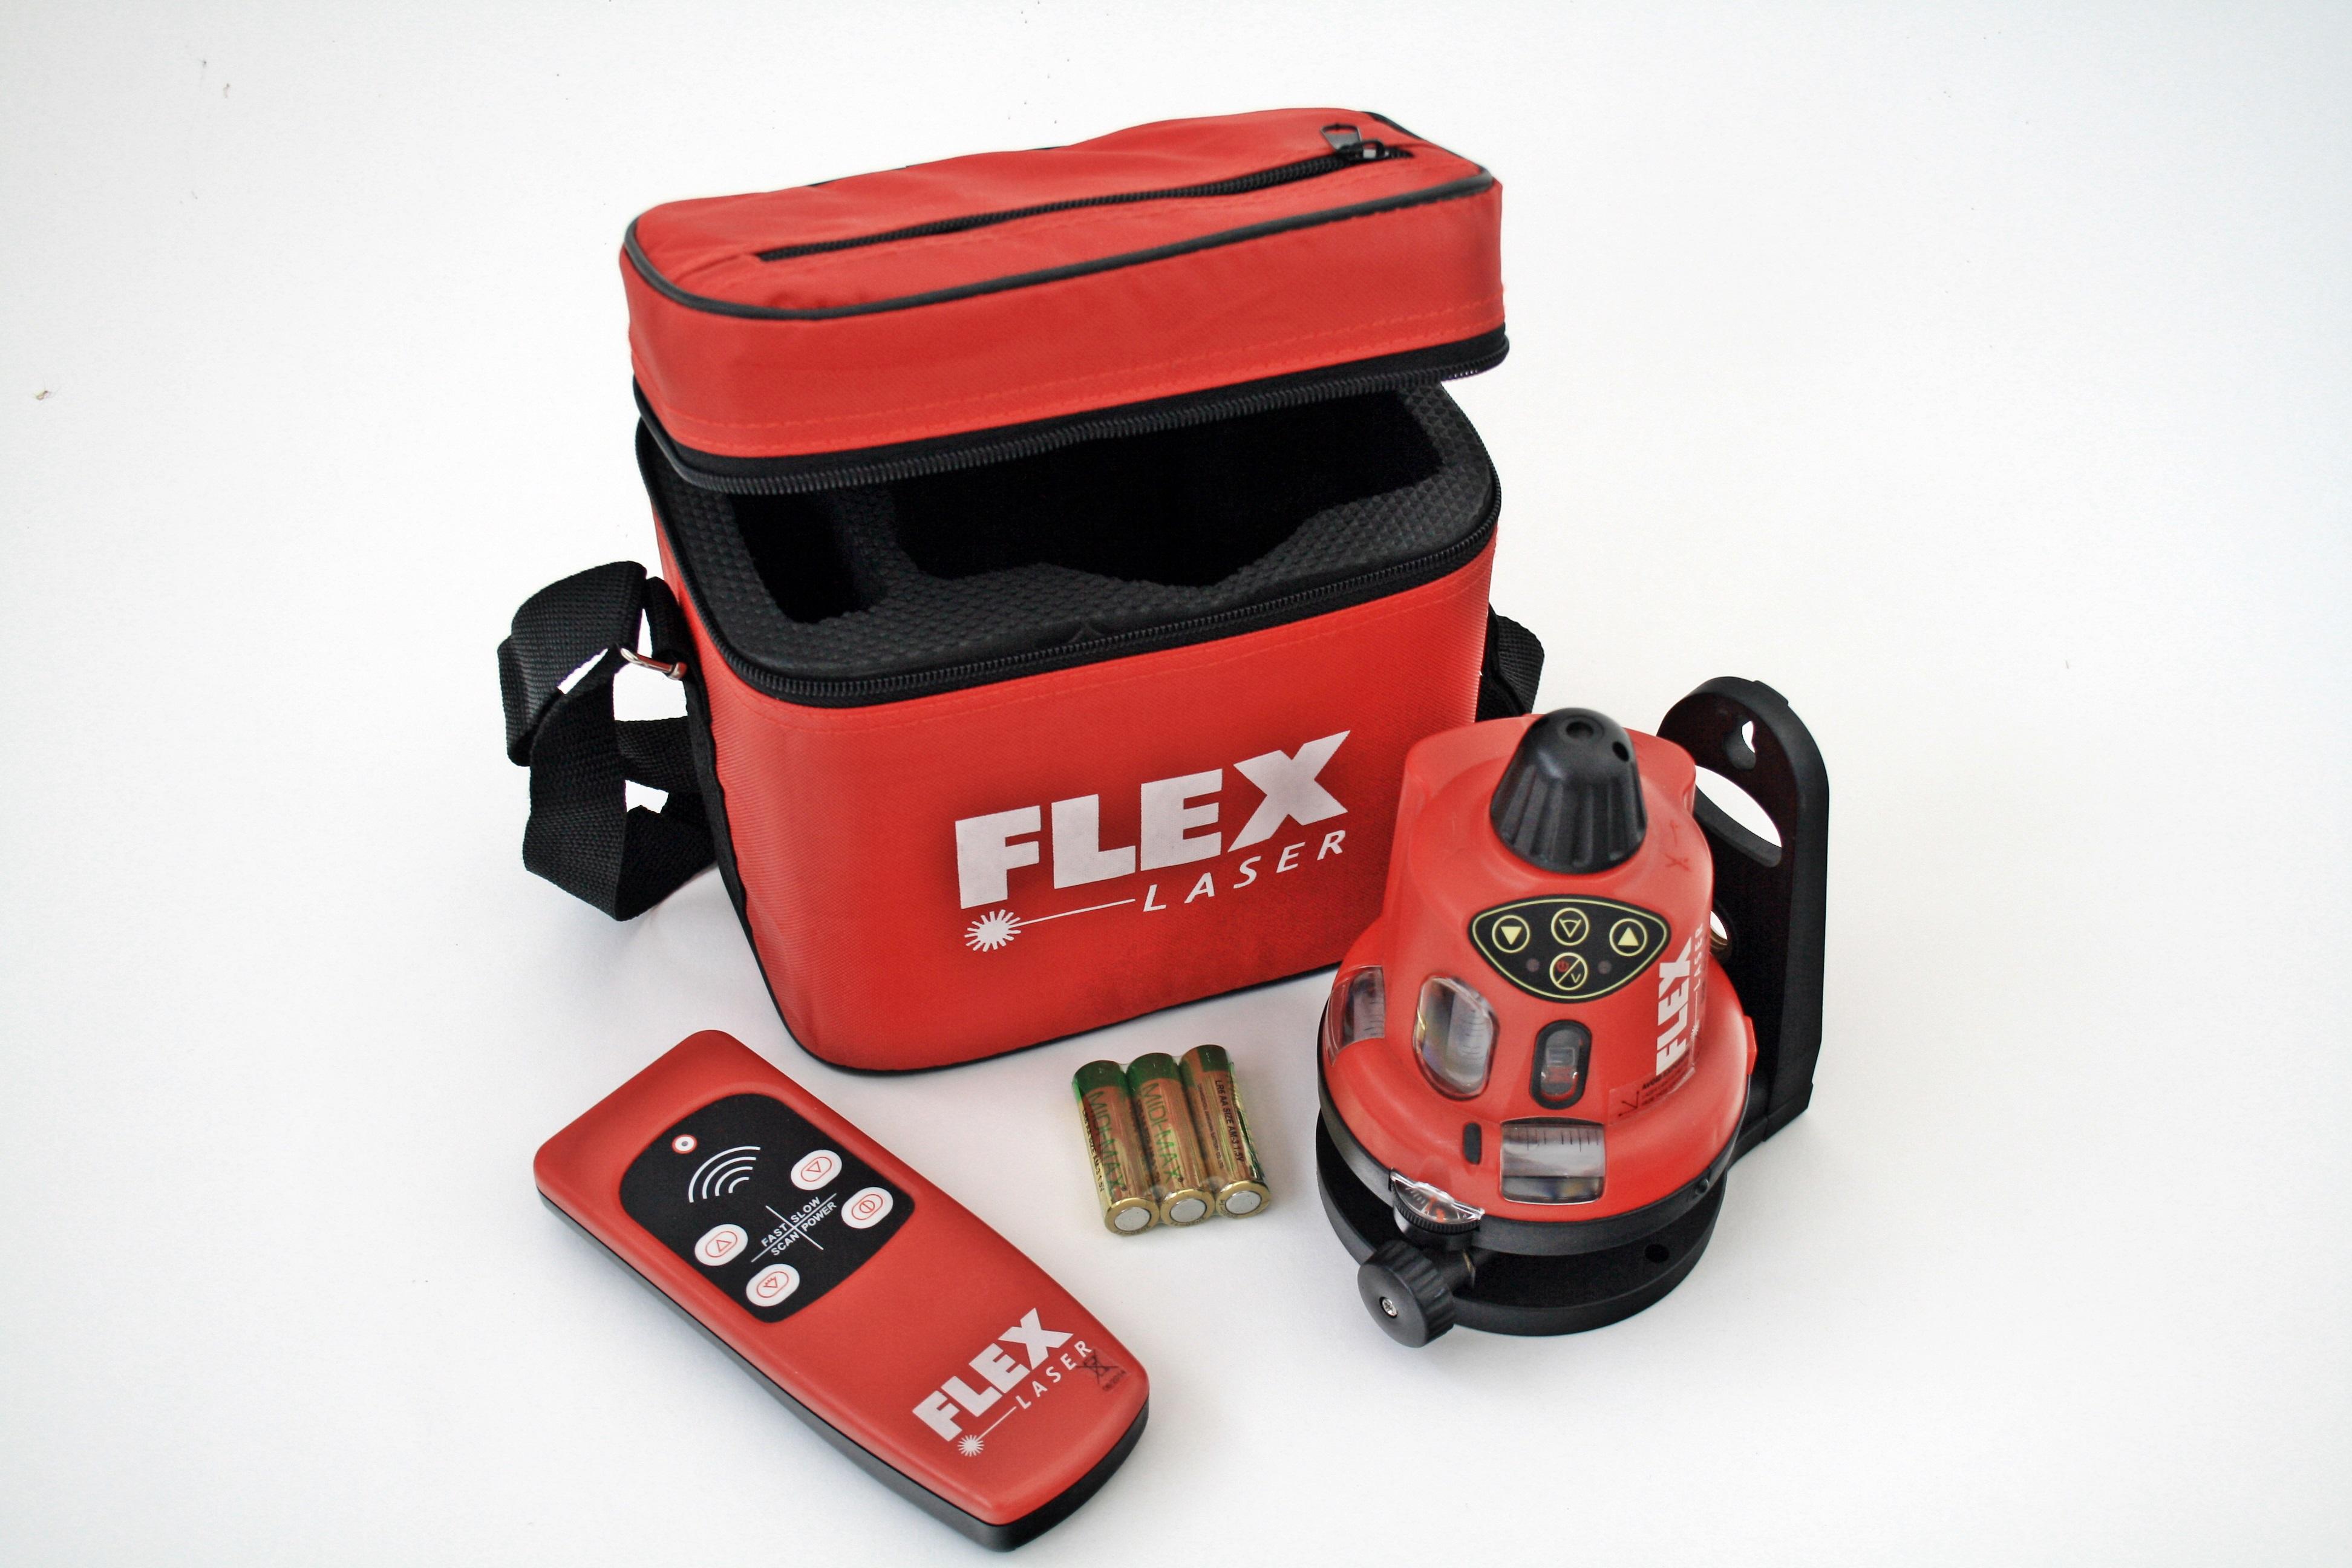 Flex rotationslaser alr sonderposten lasermessgeräte